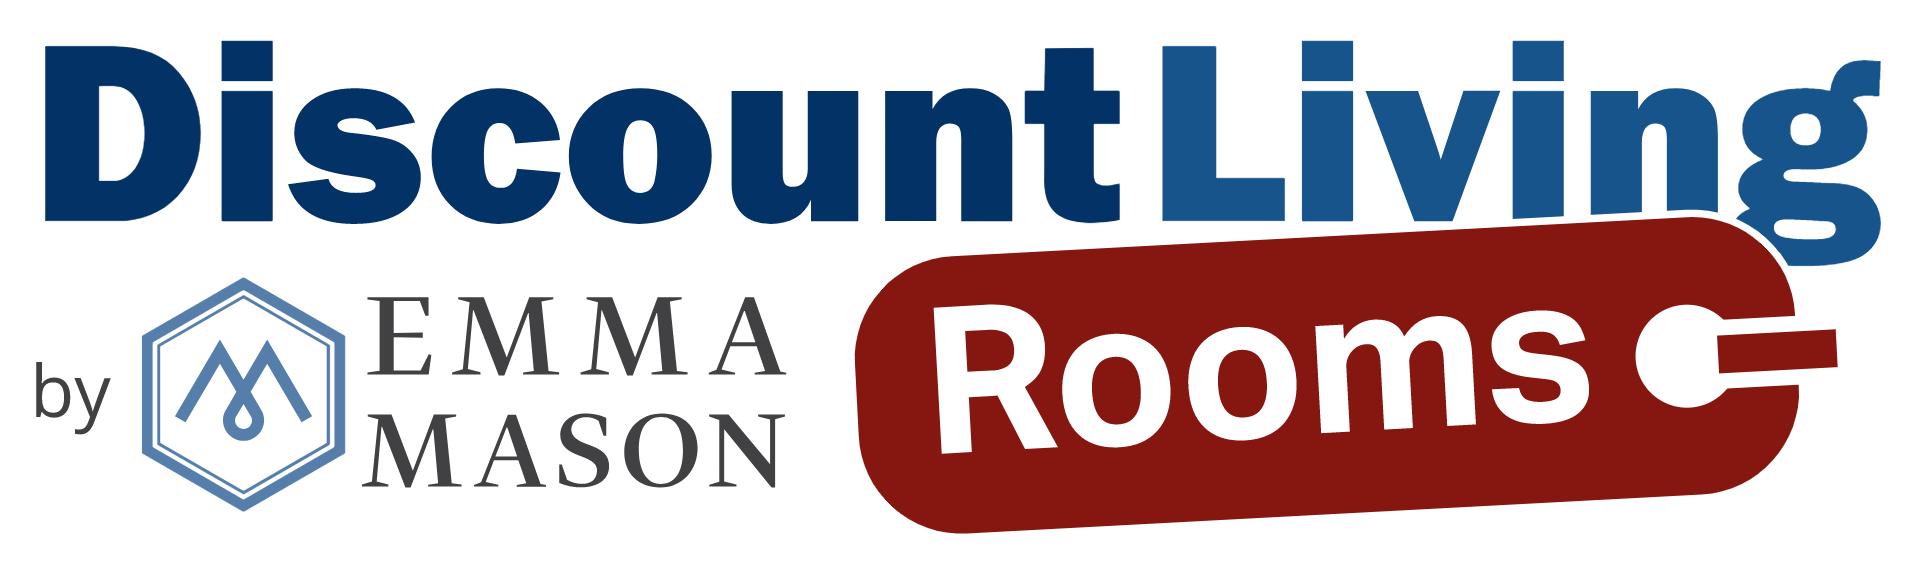 DiscountLivingRooms.com Coupon Codes October 2021